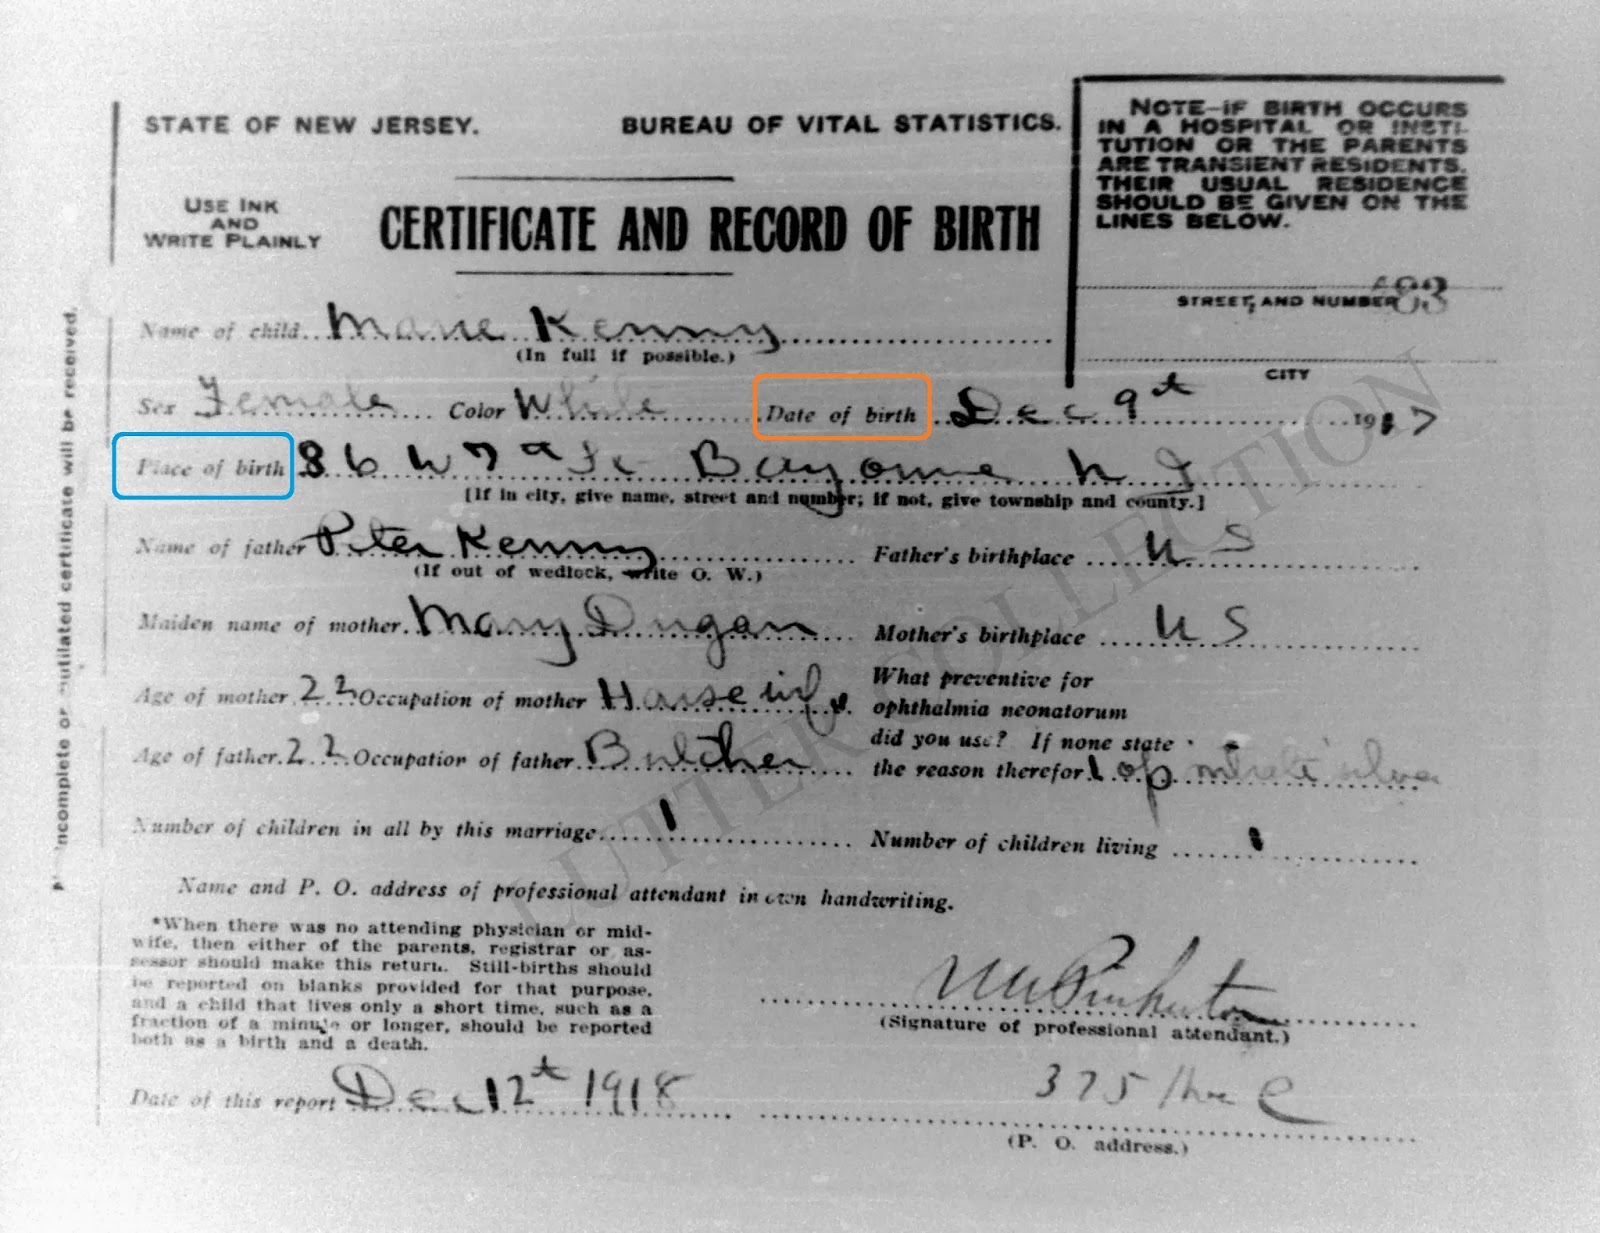 How to get my birth certificate nj best design sertificate 2017 how to obtain my birth certificate in newark nj legalbeagle xflitez Images